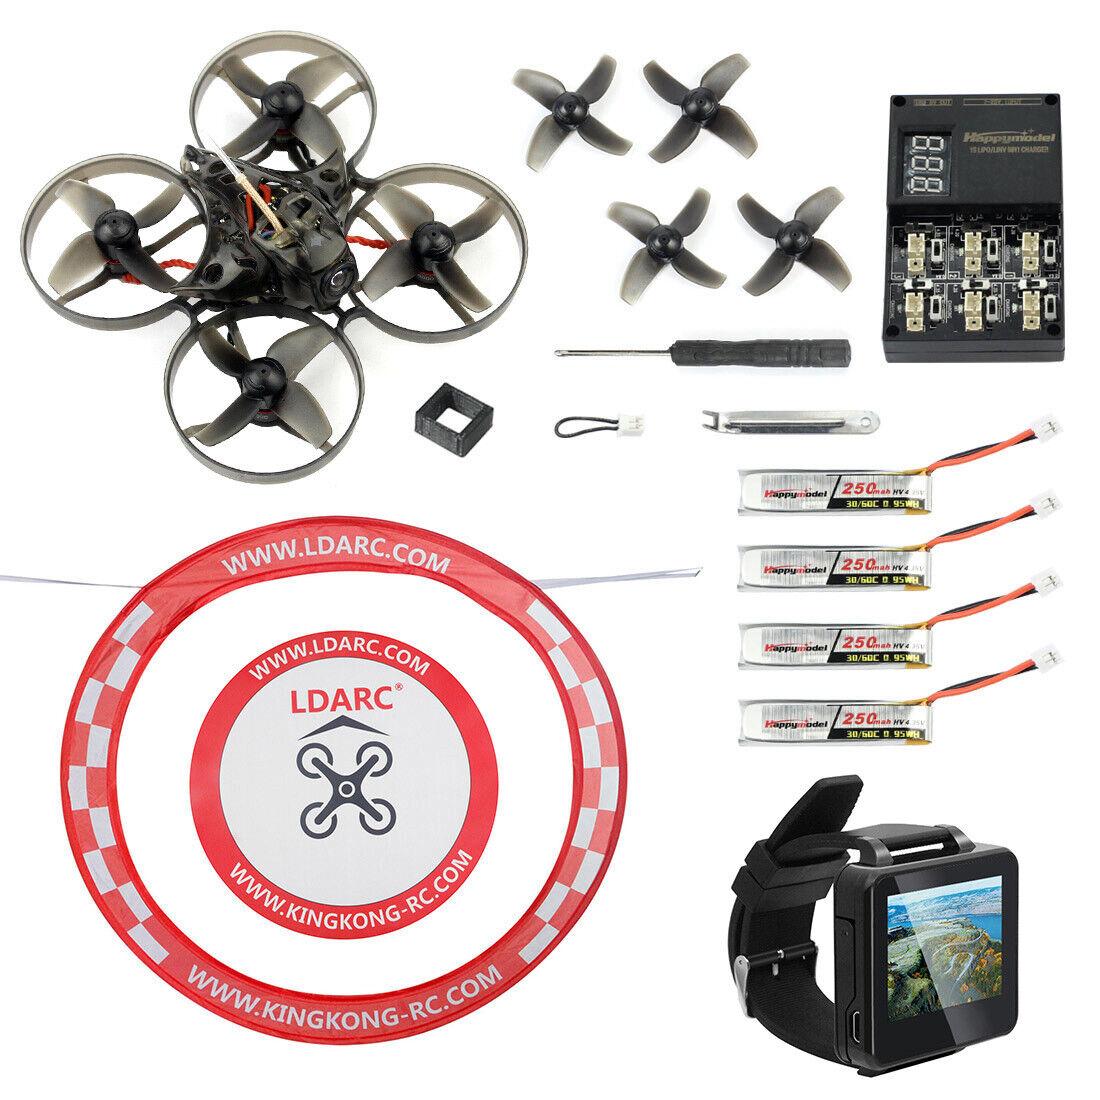 Happymodellolo Mobula7 V2 75mm Crazybee F3 Pro OSD SWhoop FPV  Racing Drone  ordinare on-line